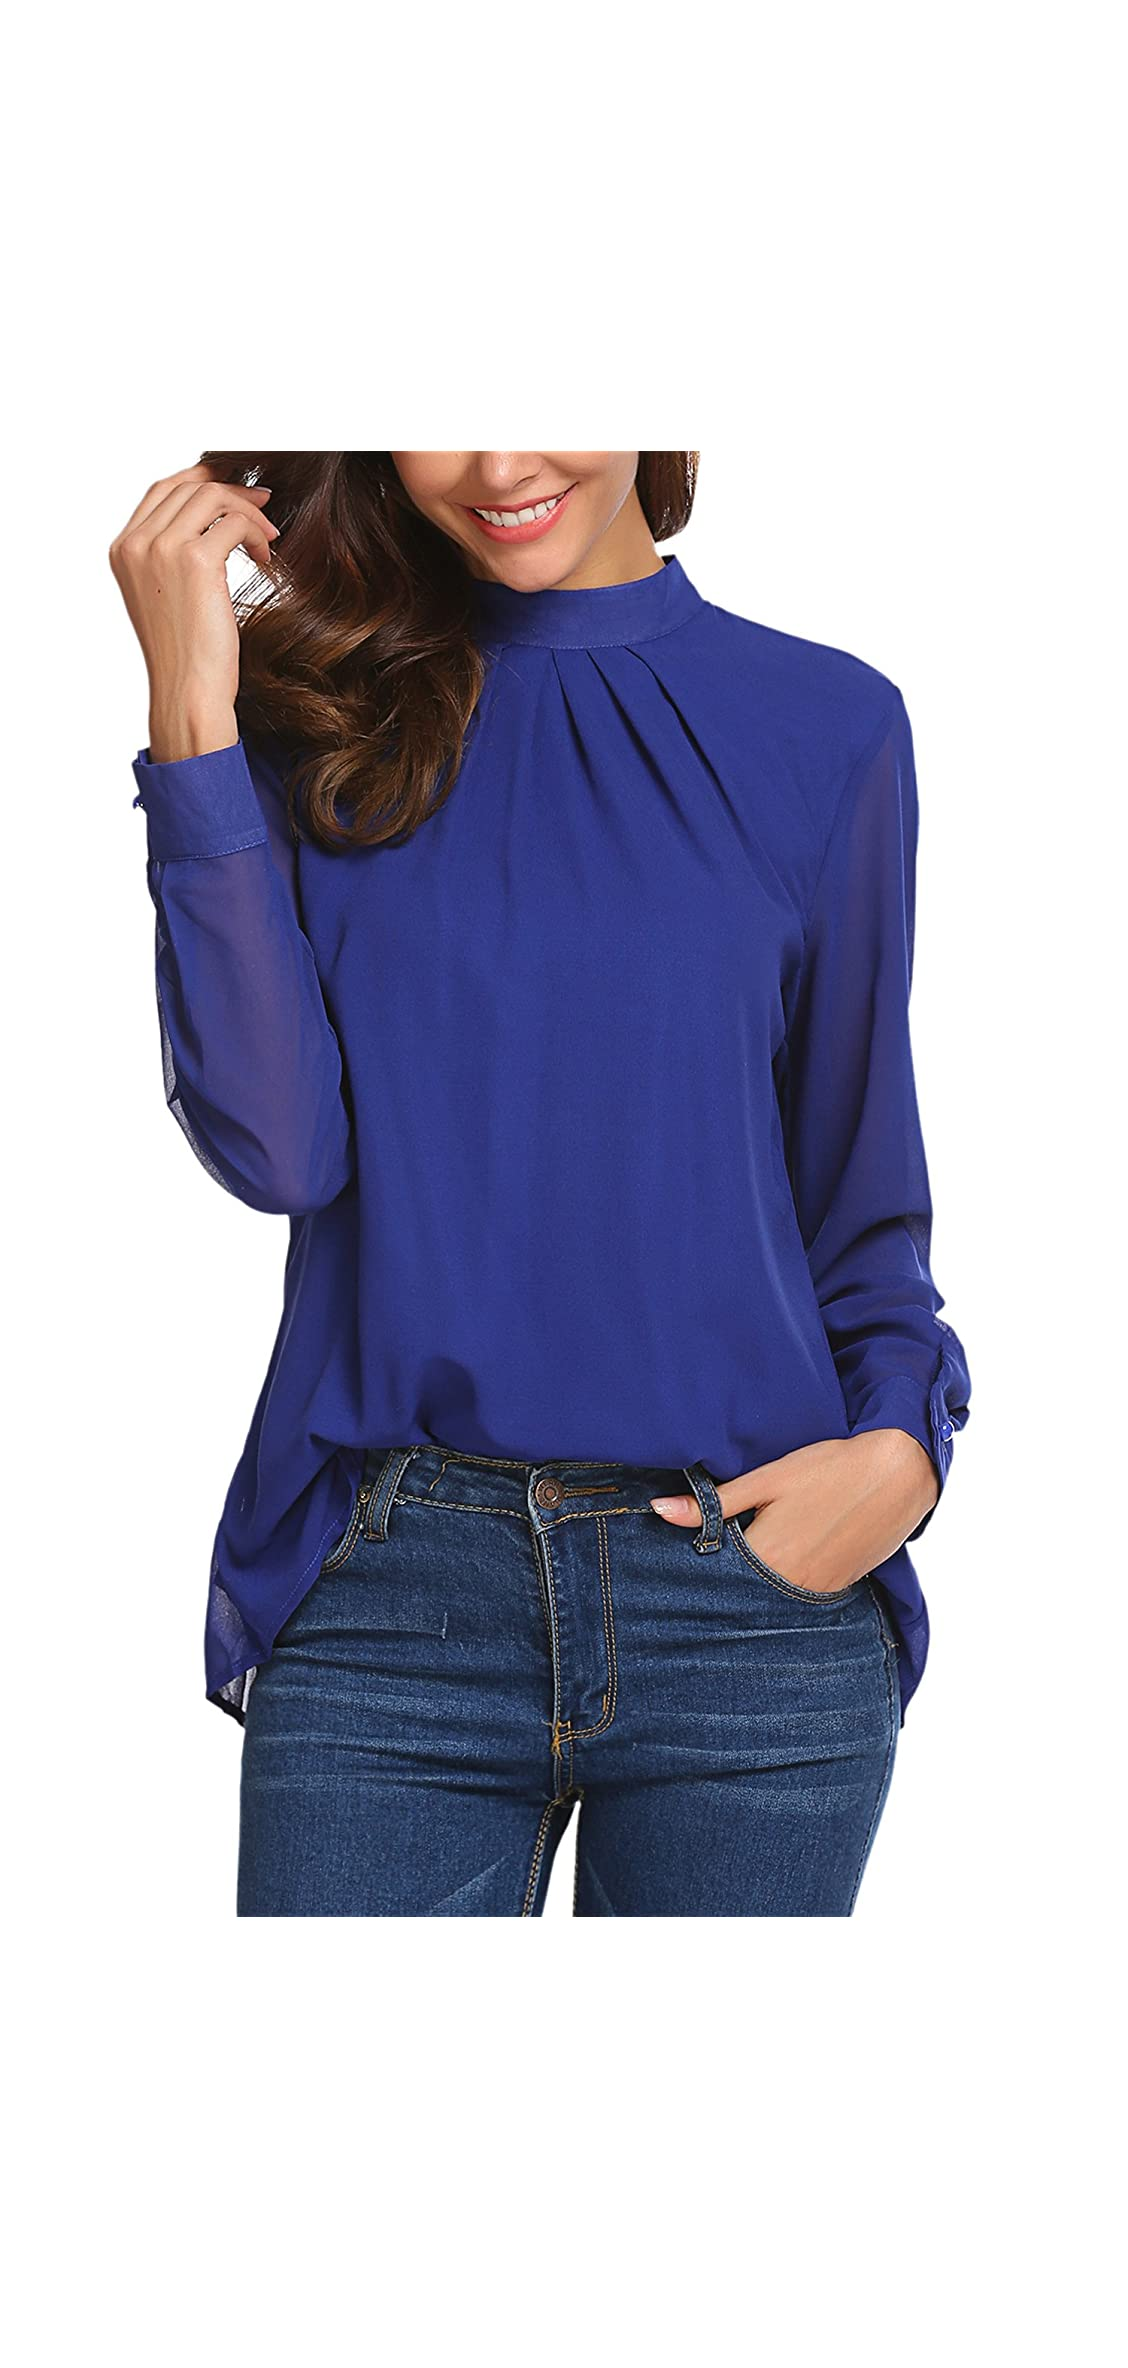 Long Sleeve Chiffon Blouse Women's Loose Casual Cuffed